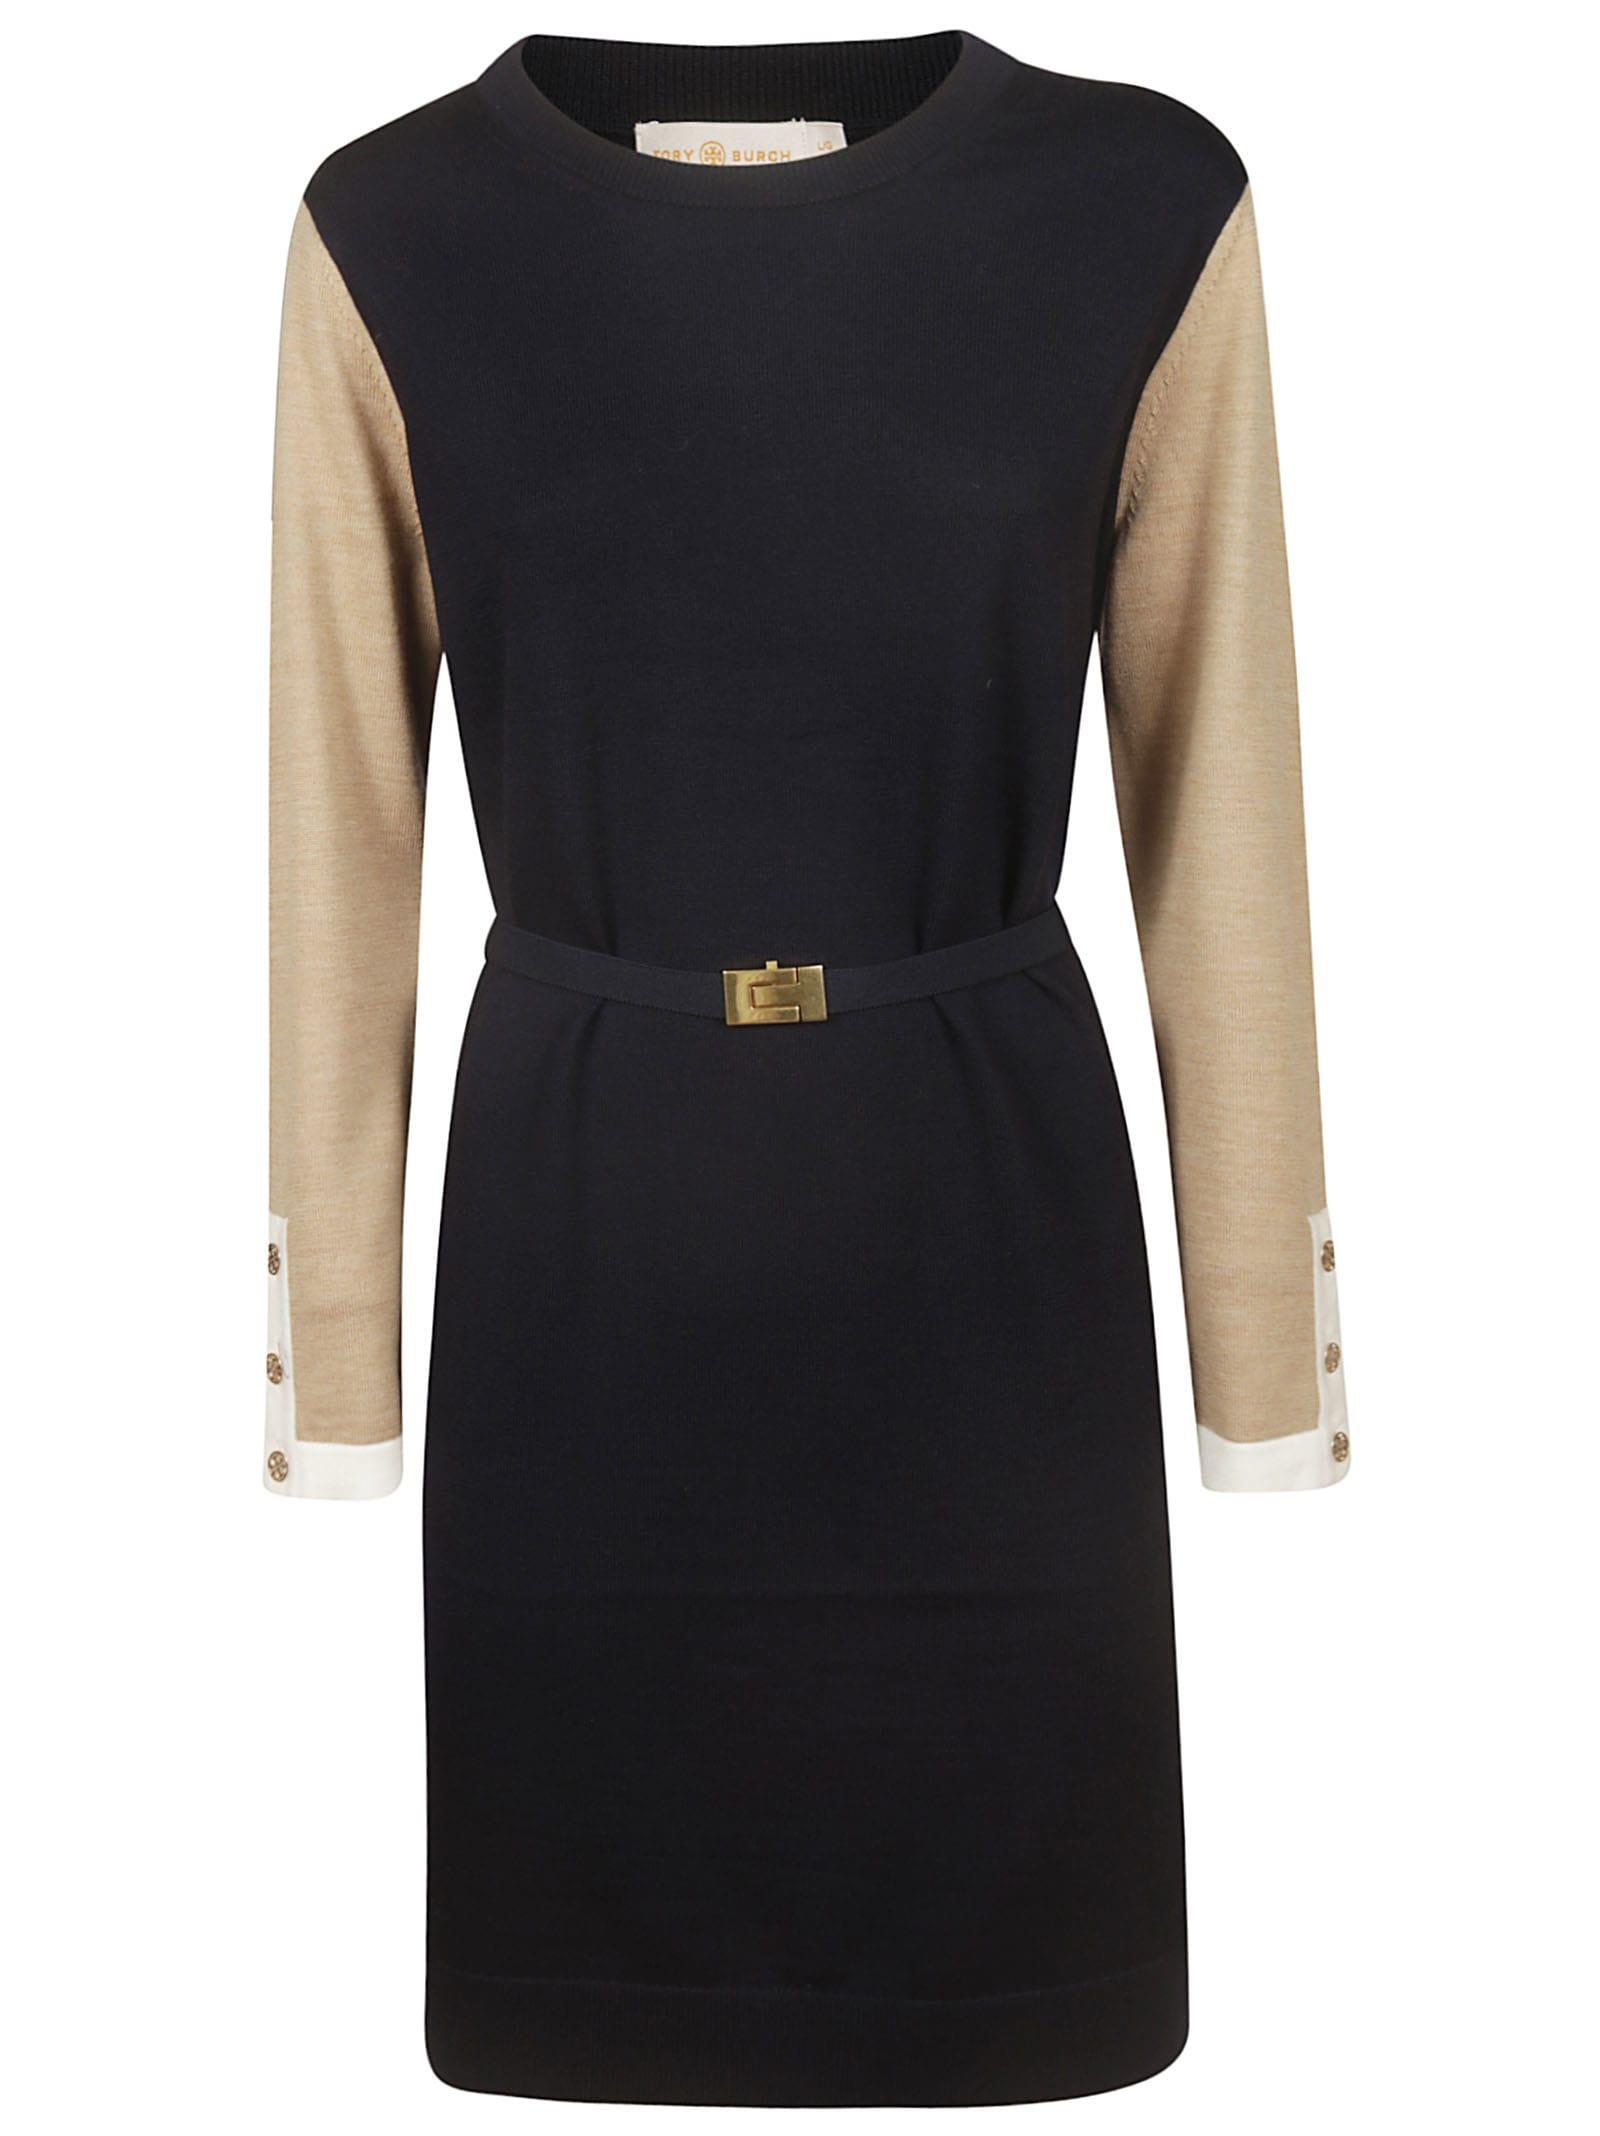 Photo of  Tory Burch Color Block Kendra Dress- shop Tory Burch  online sales